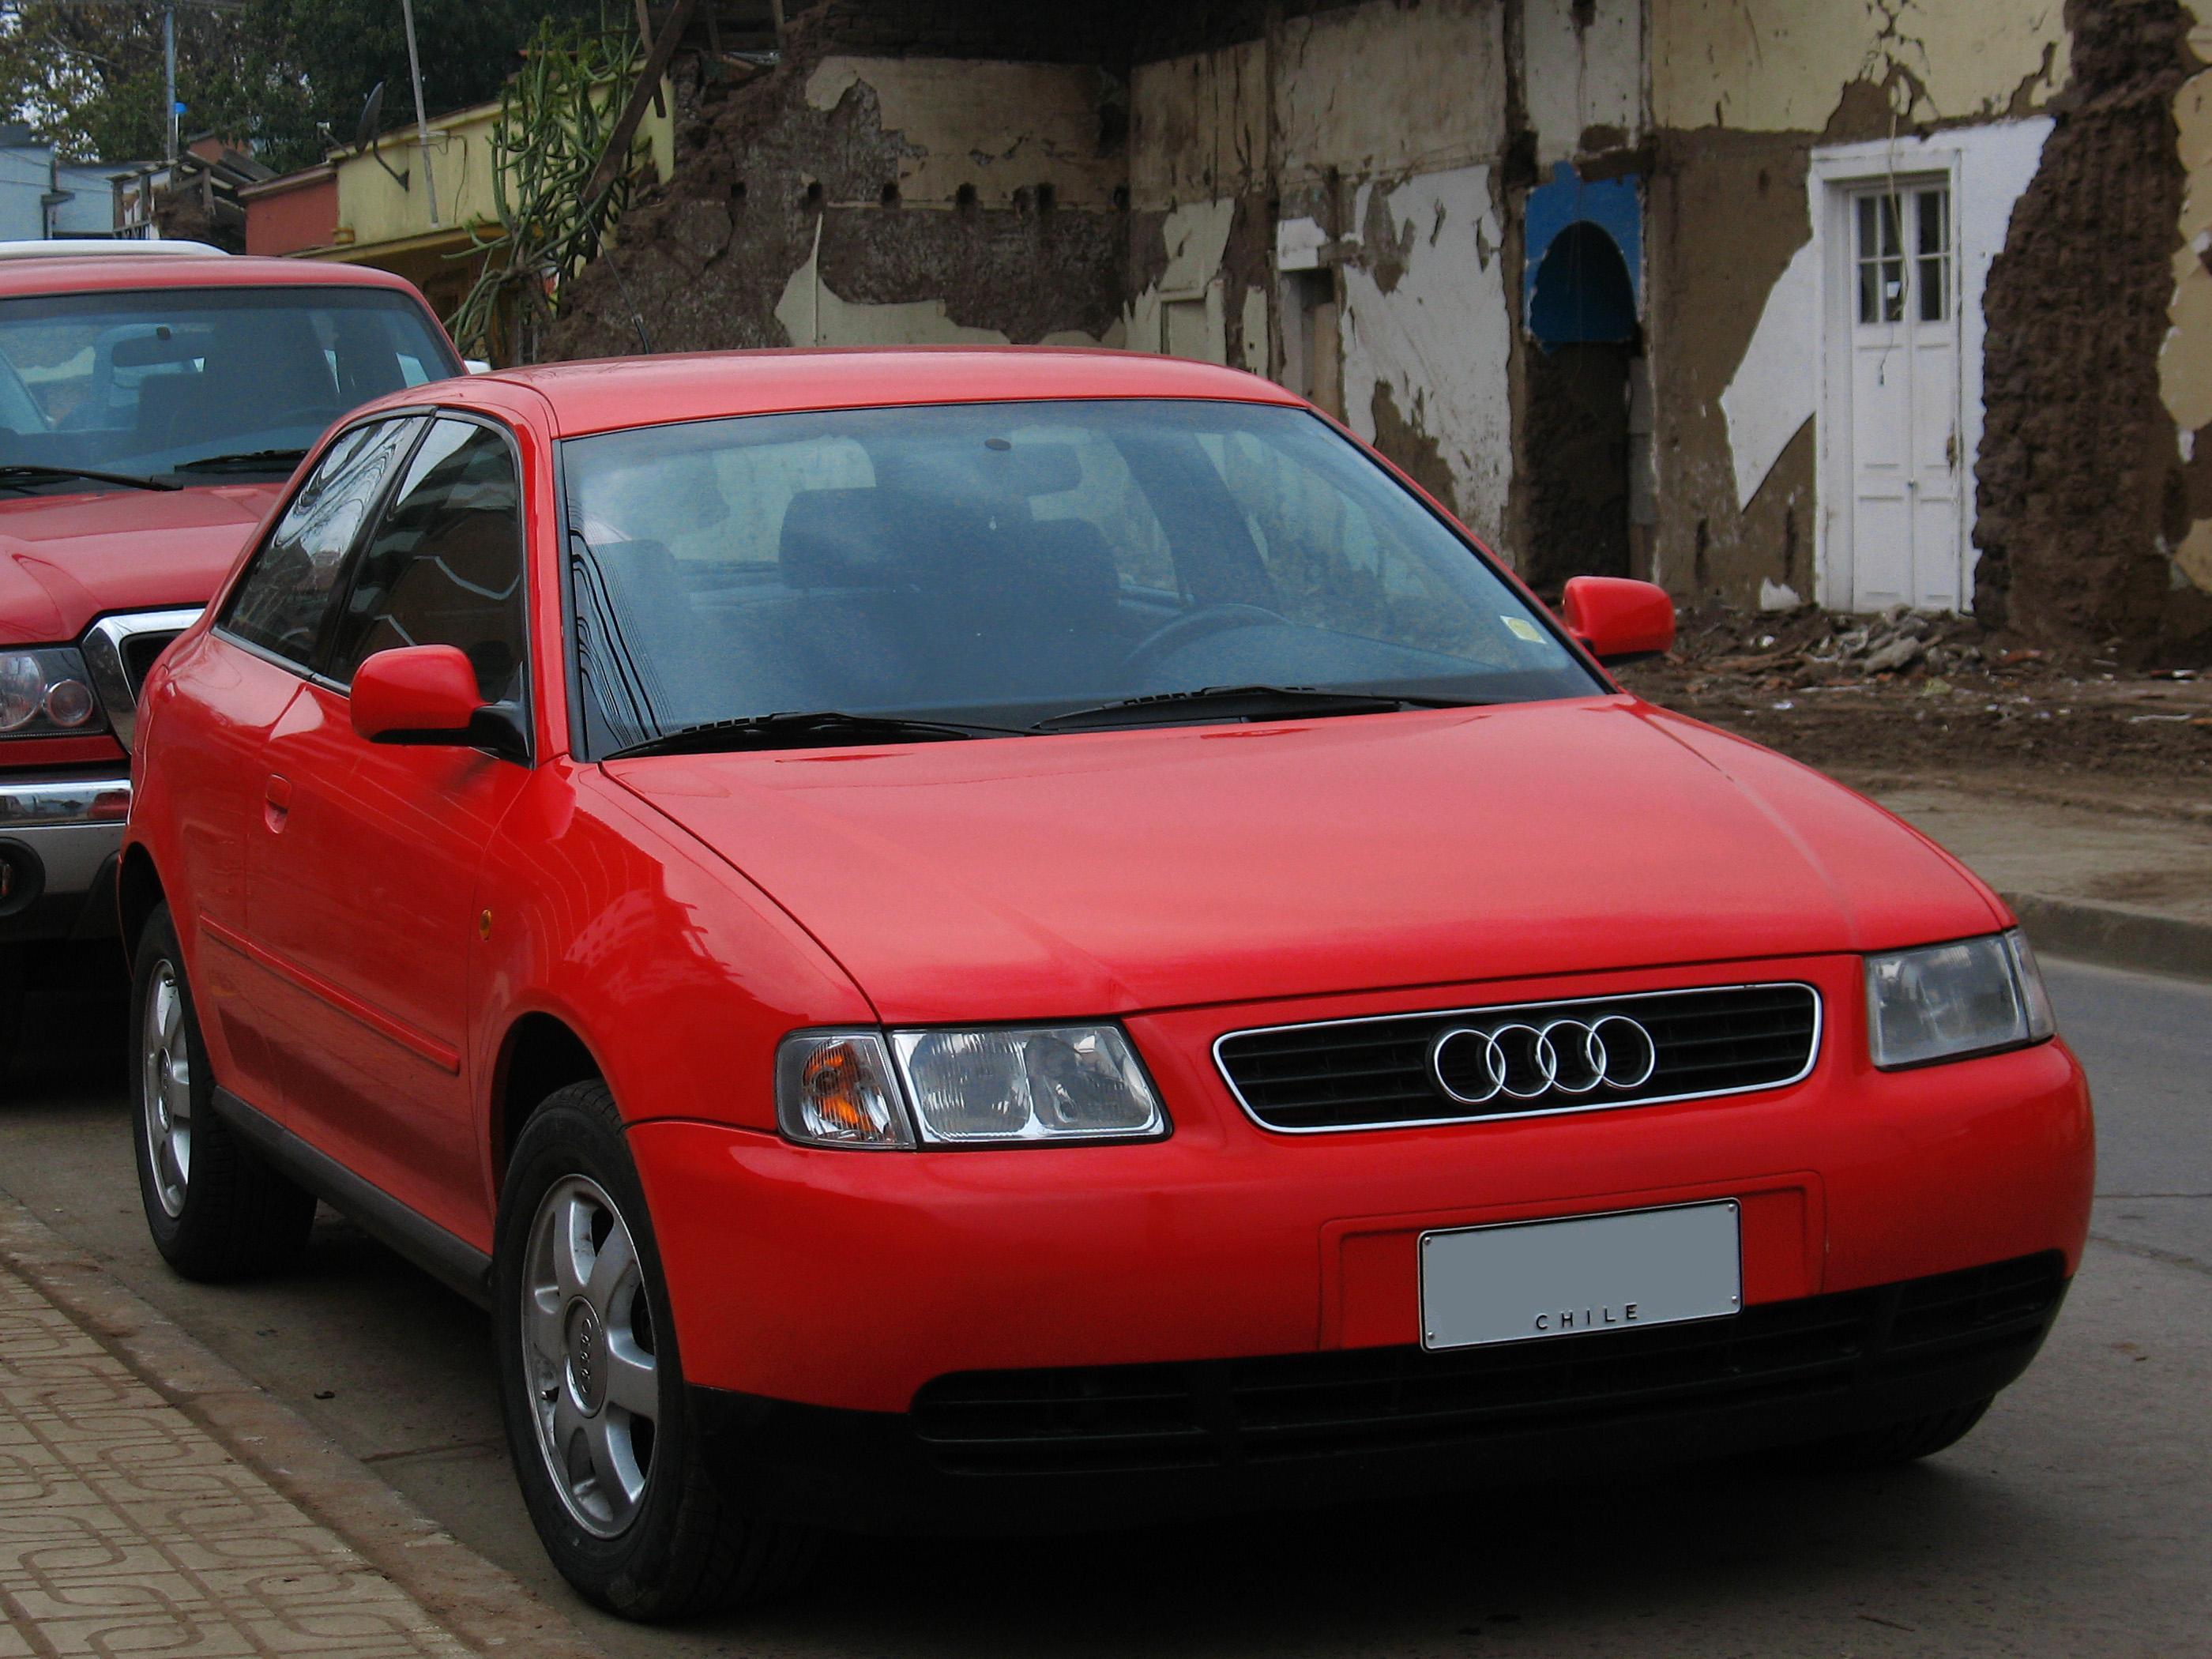 Kelebihan Kekurangan Audi S3 1.8 T Murah Berkualitas